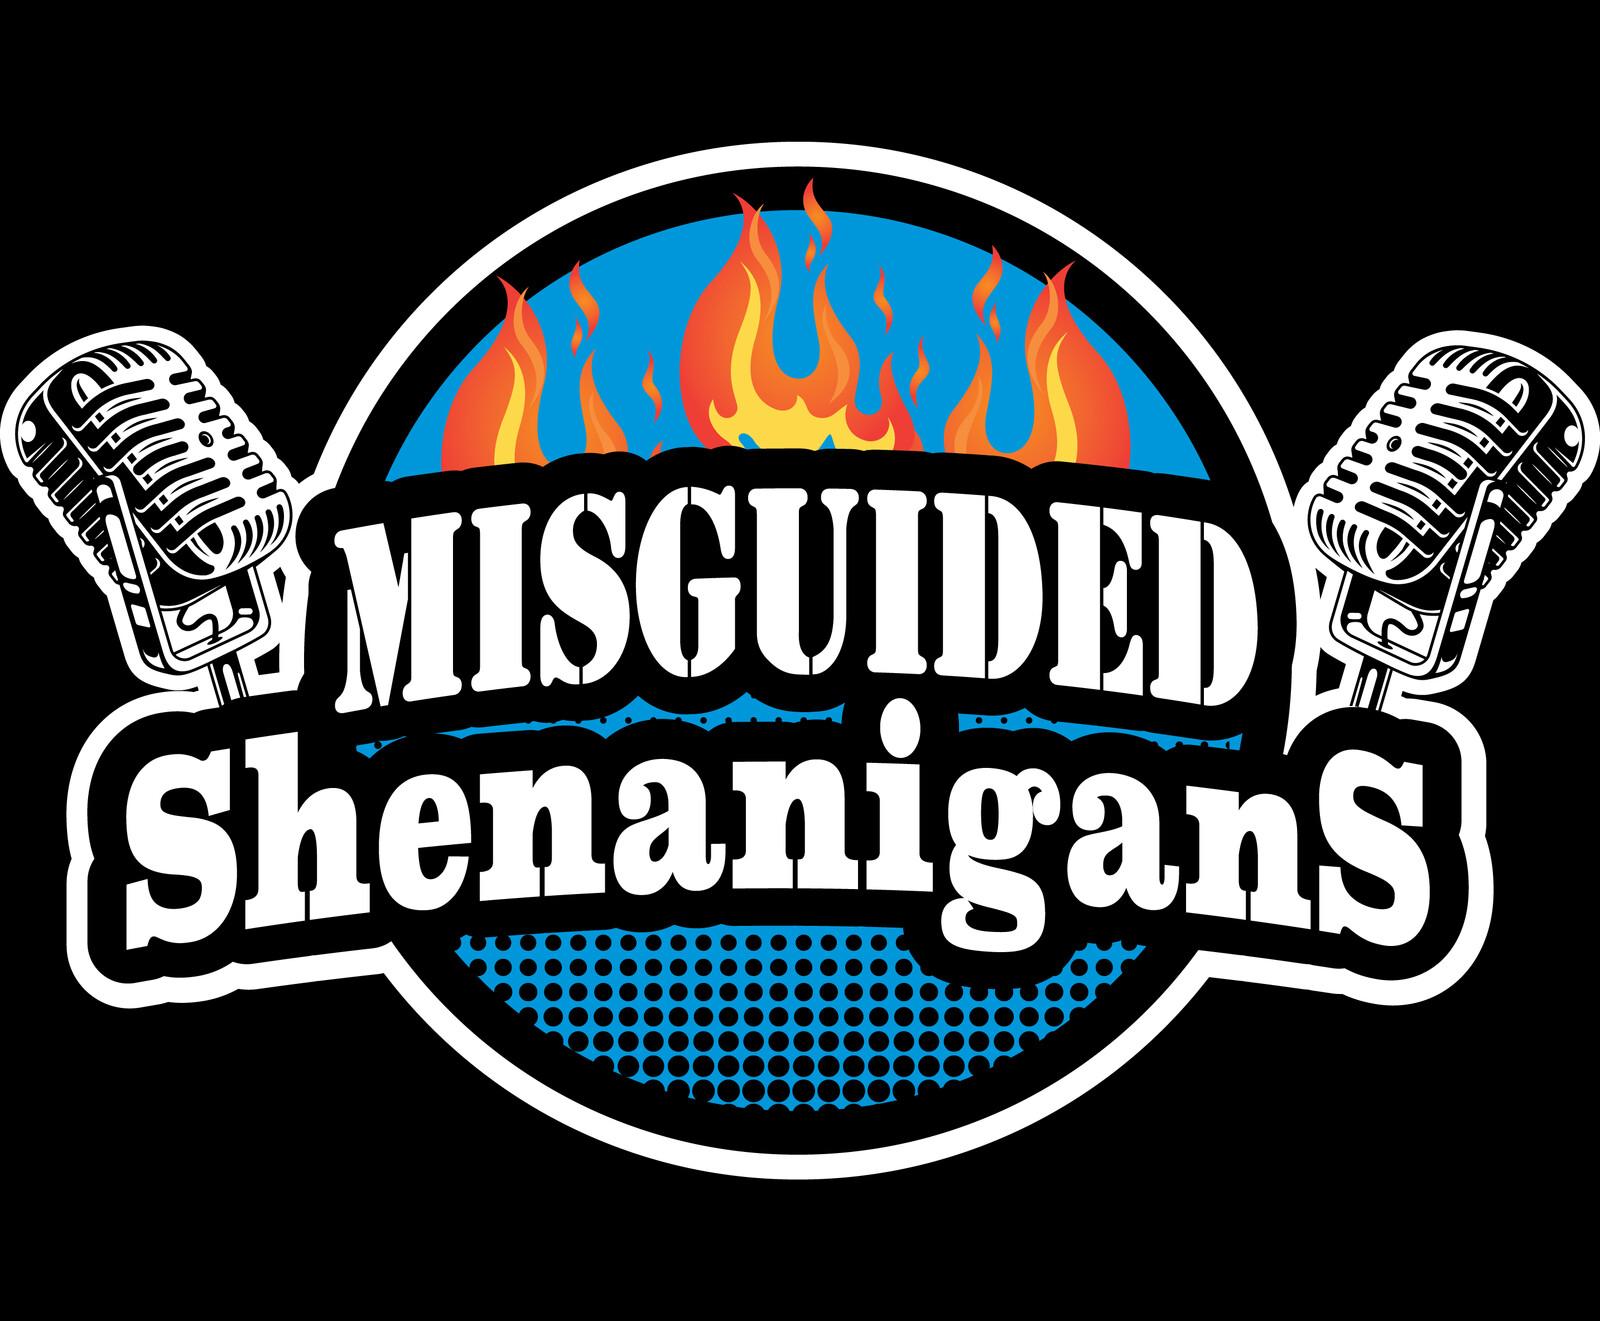 Misguided Shenanigans Podcast Logo